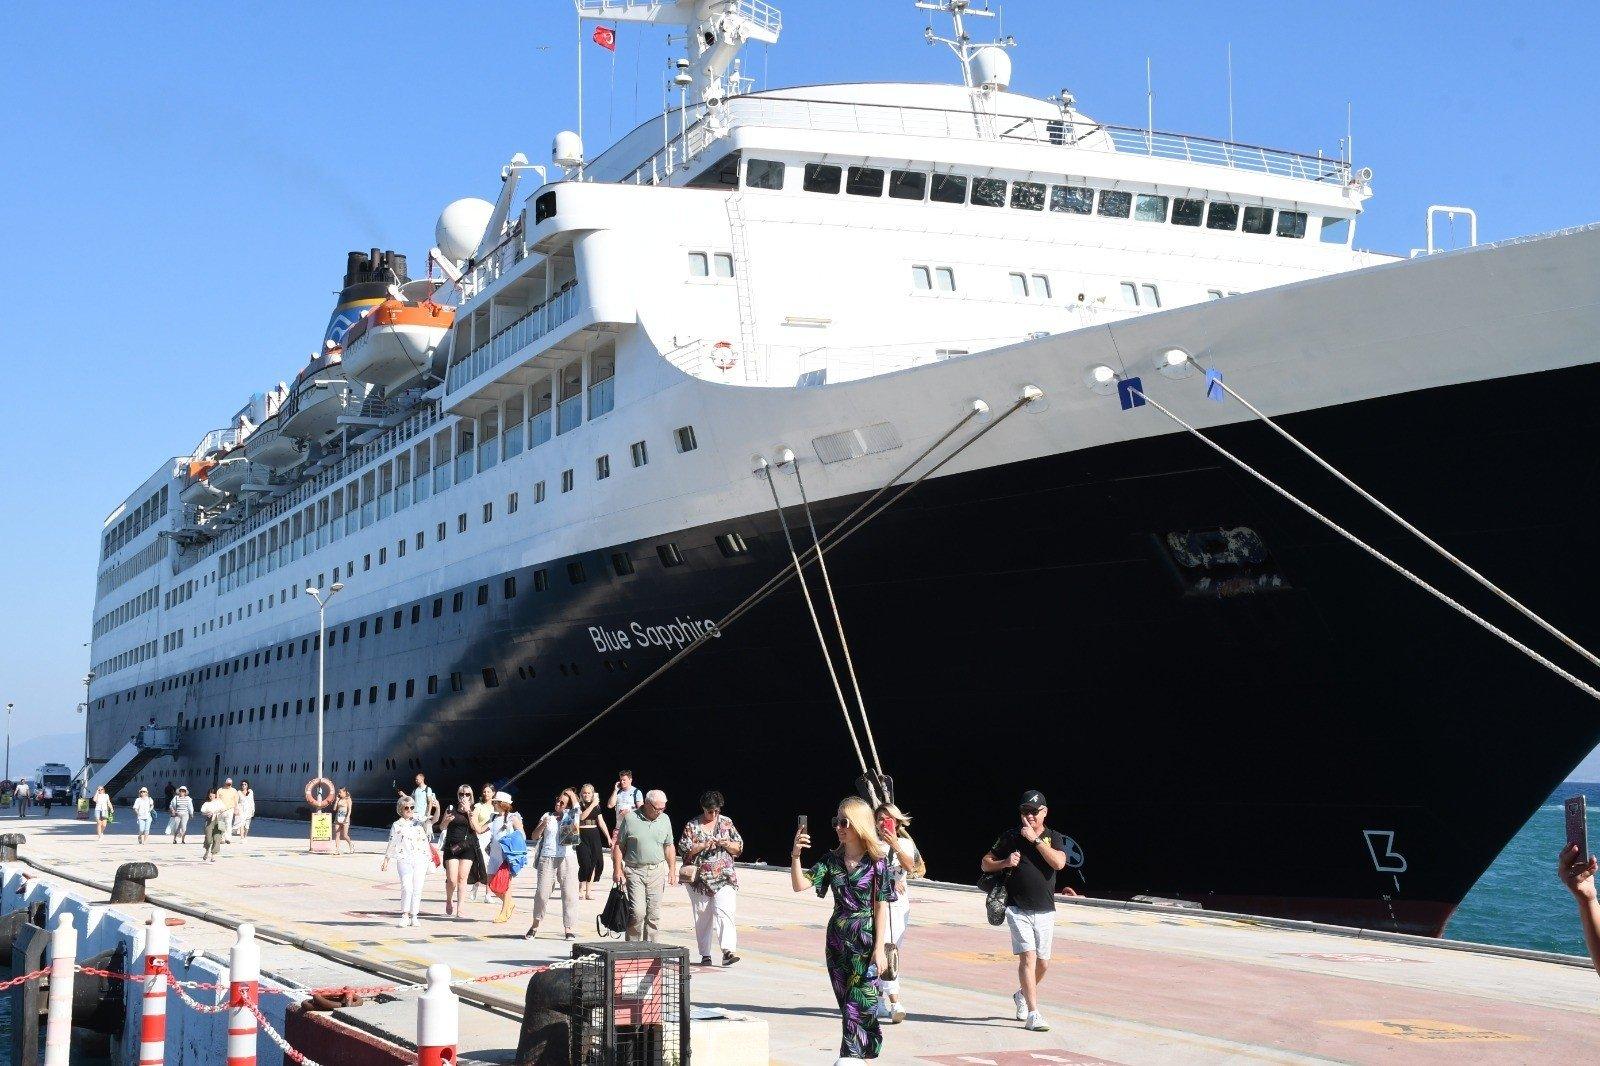 Tourists disembark from a cruise ship at Ege Port on Kuşadası in Aydın province,southwestern Turkey, Sept. 2, 2021. (IHA Photo)